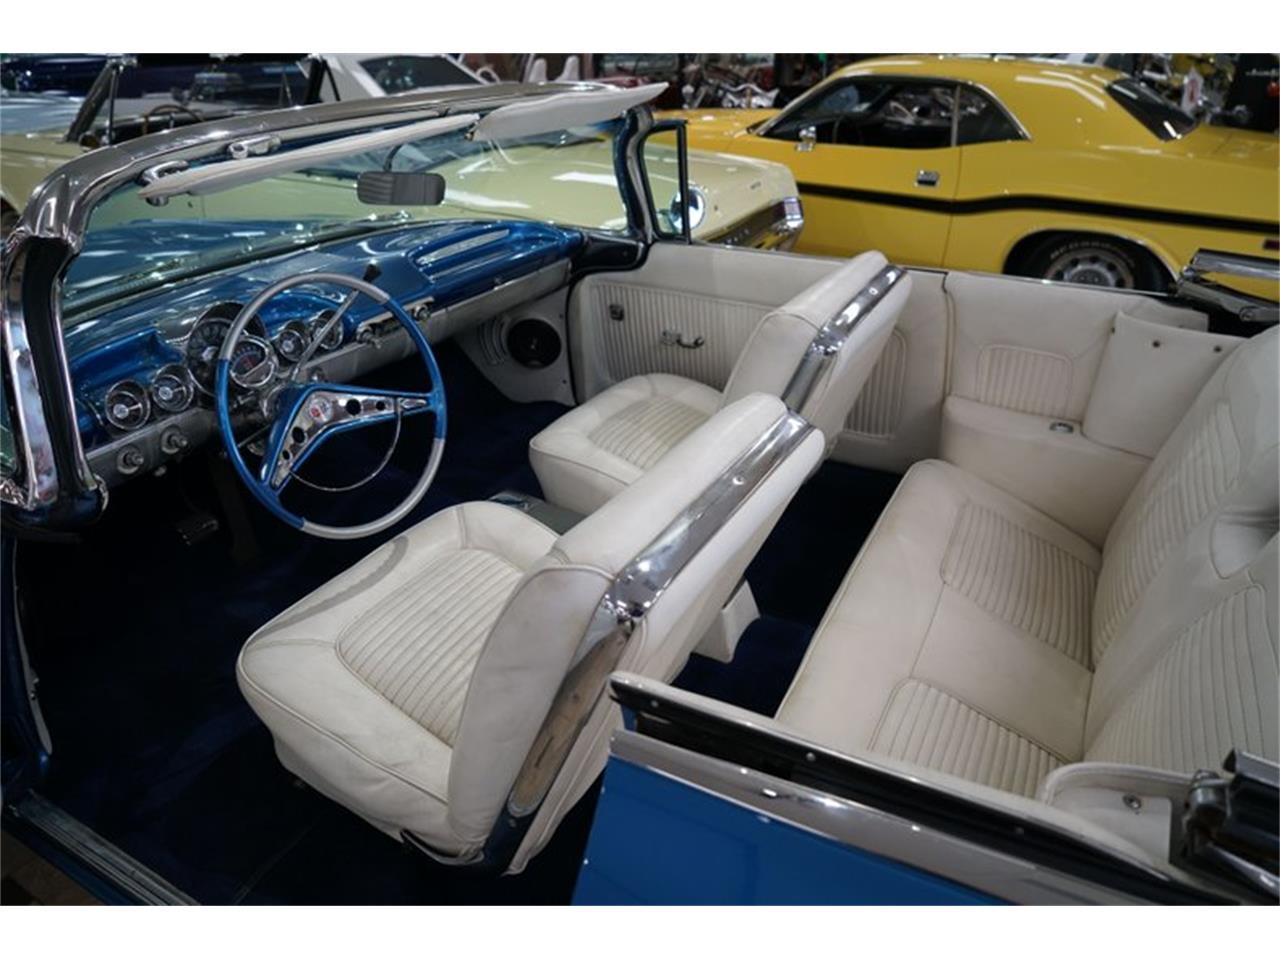 1960 Chevrolet Impala (CC-1258674) for sale in Venice, Florida